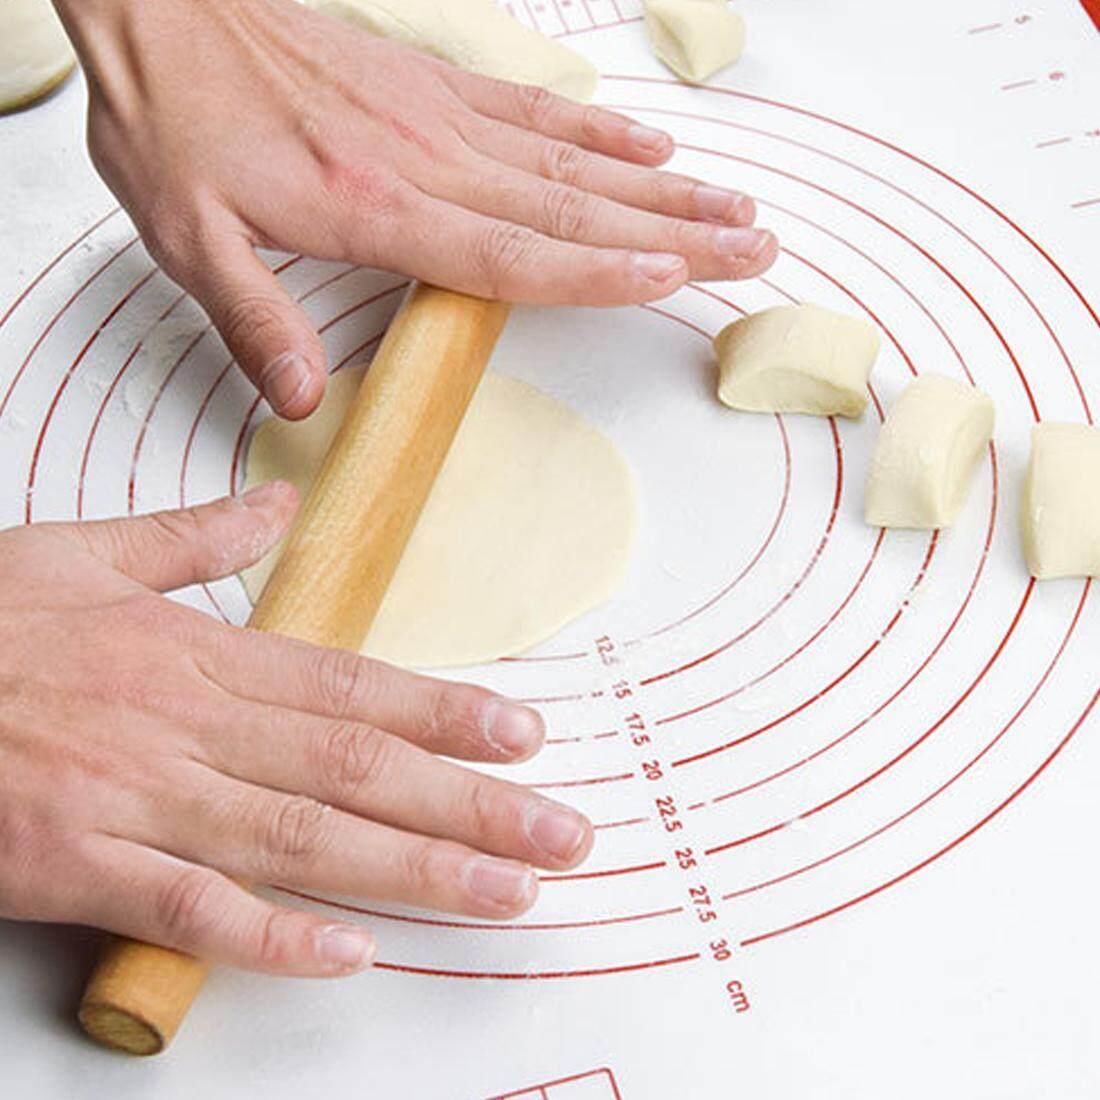 40X60 Cm Silikon Fiberglass Loyang Penggulung Adonan Kue Kering Kue Bakeware Penggaris Alas Alas Oven Pasta Alat Memasak -Internasional